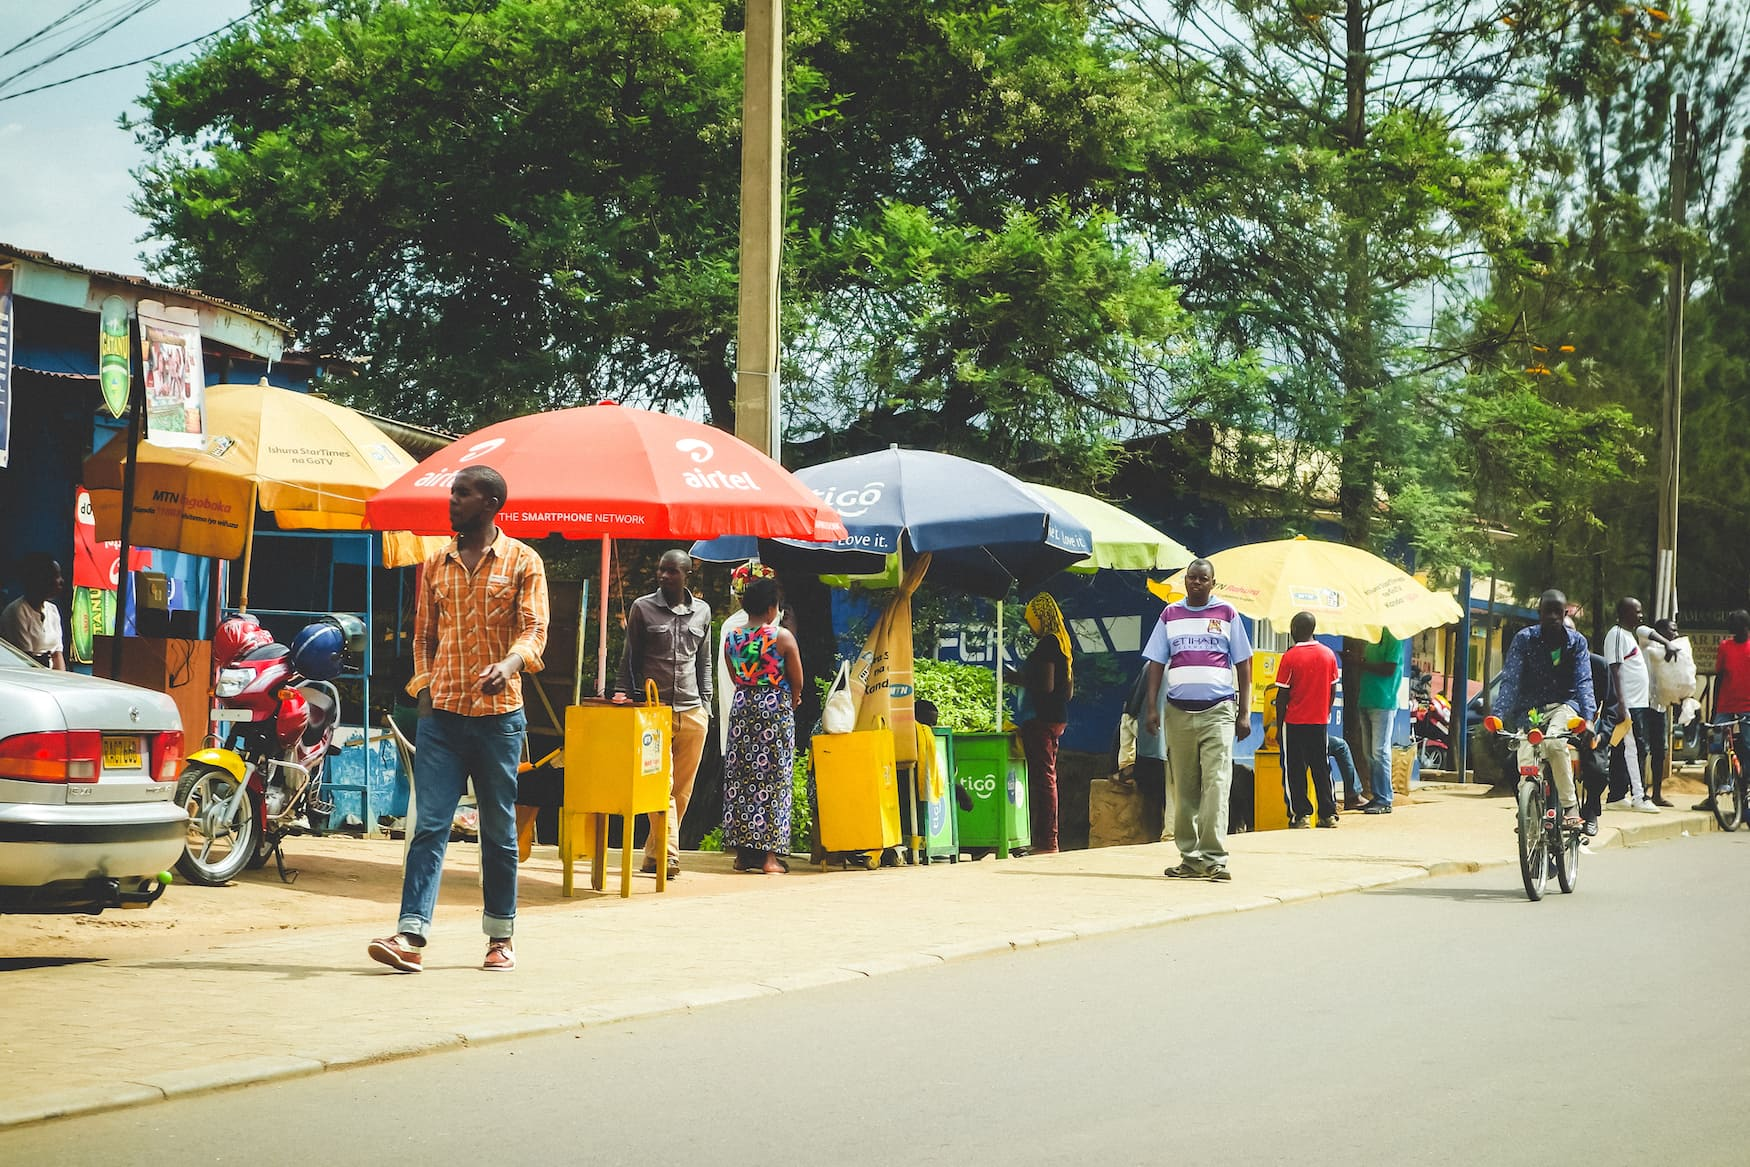 Locals auf Markt in Kigali, Ruanda